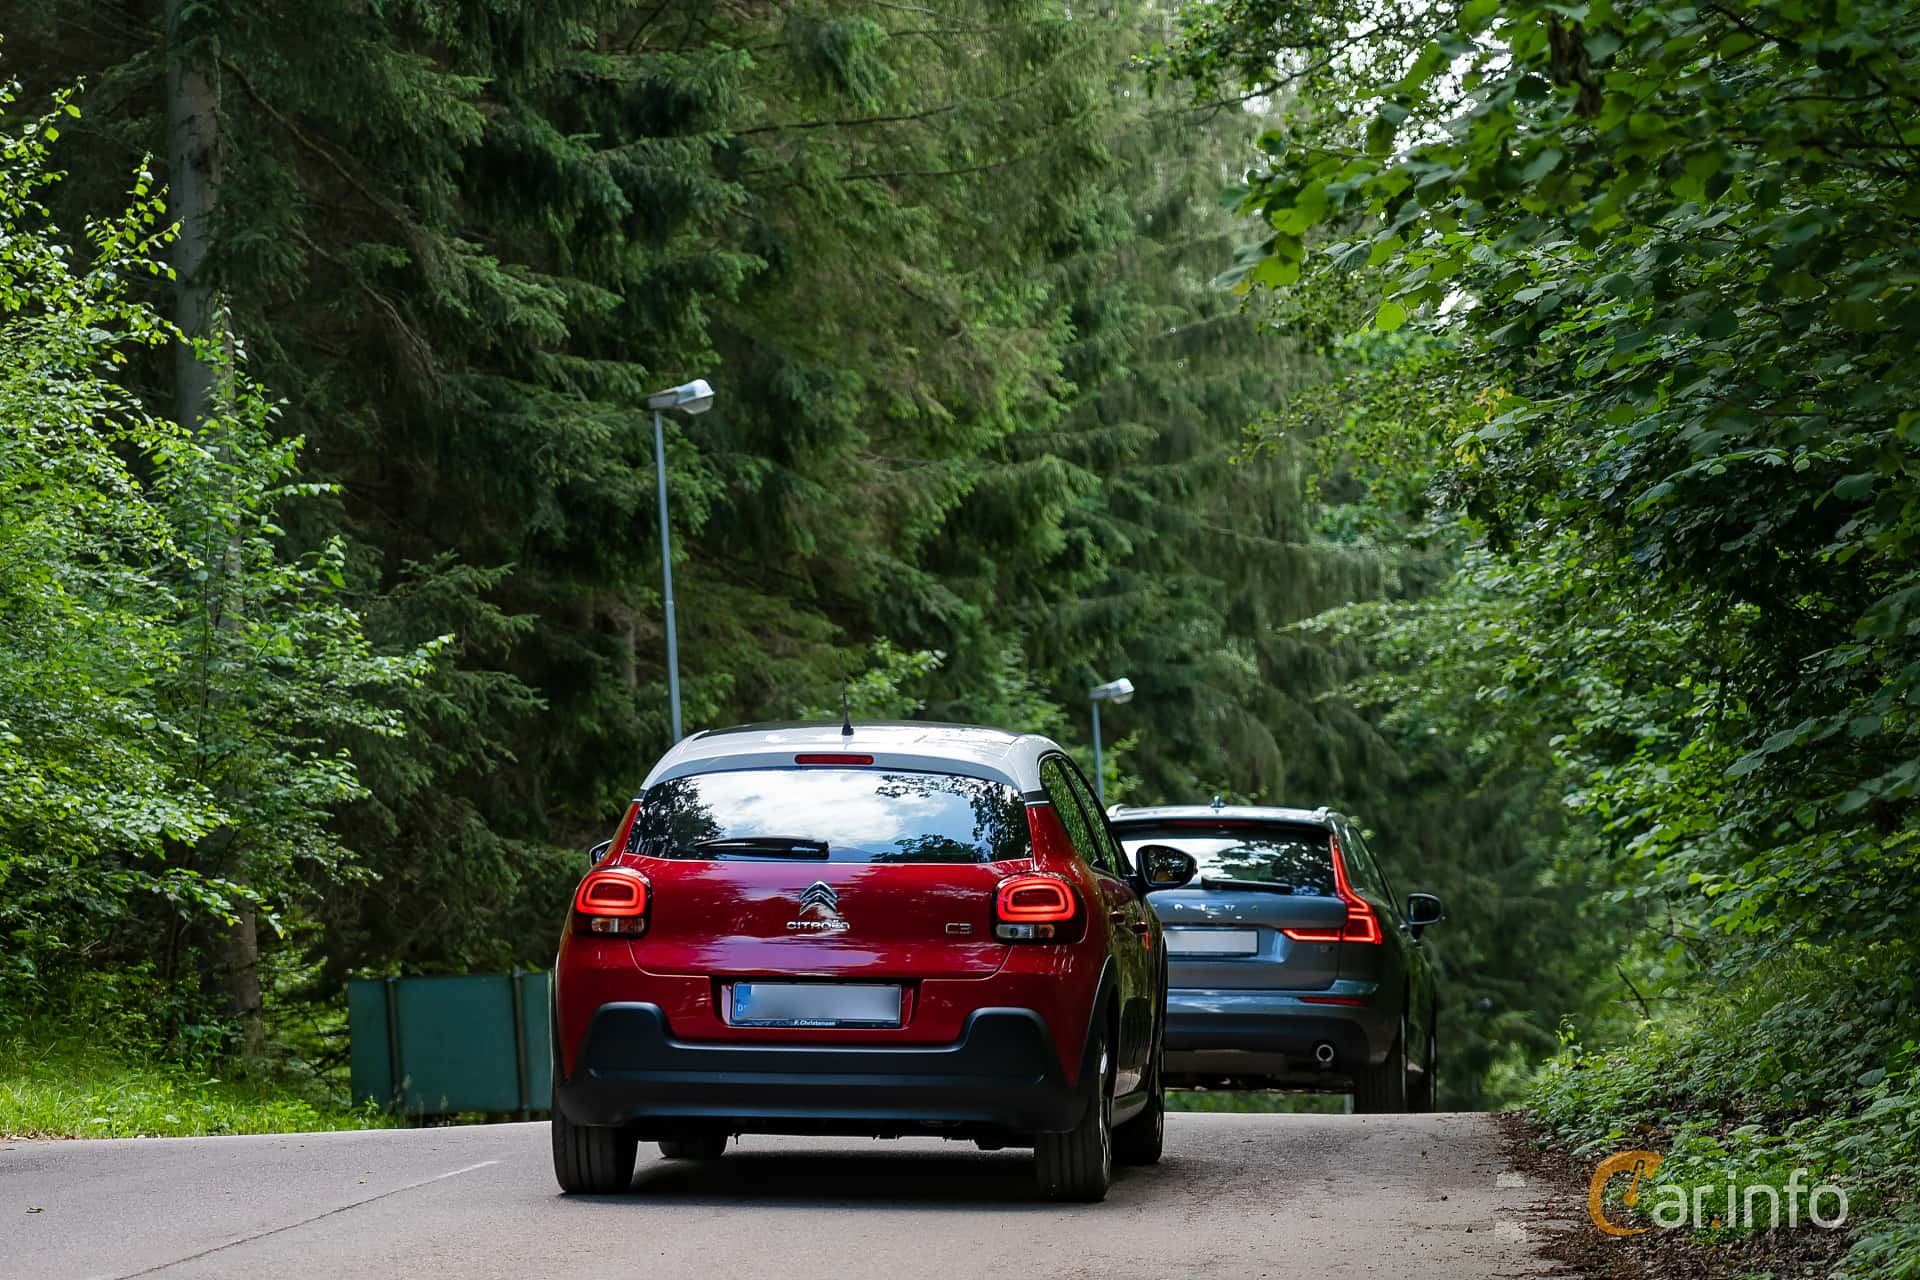 Citroën C3 1.2 PureTech Manual, 110hp, 2018 at Svenskt sportvagnsmeeting 2019